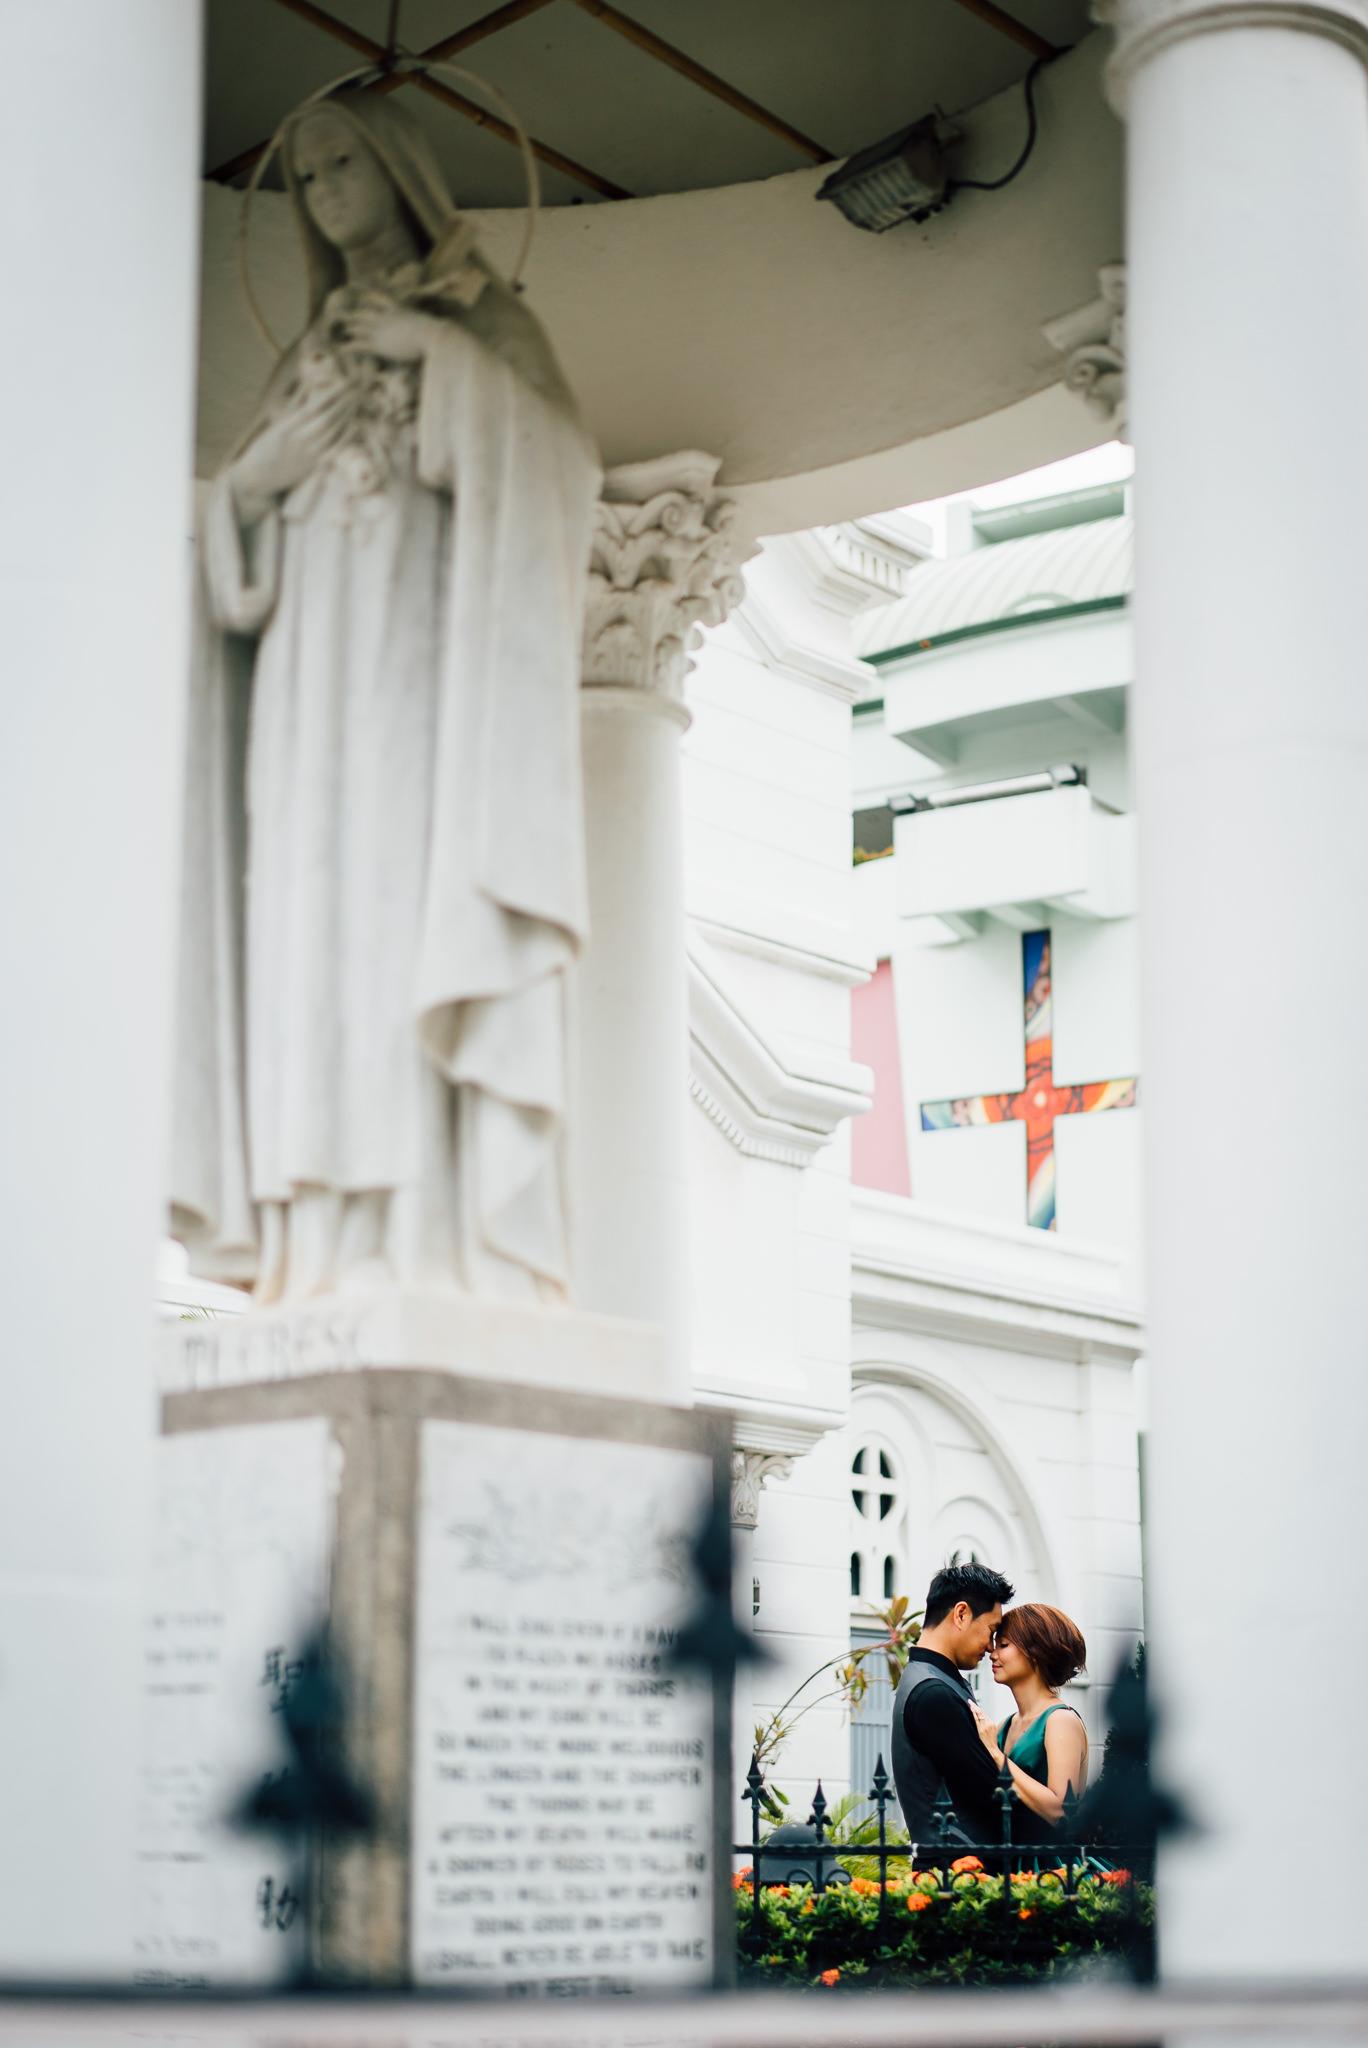 Singapore Wedding Photographer Serene & Vincent 1 degree 15 canterbury hill tuas church of saint terest pre wedding chris chang photography (24 of 31).JPG